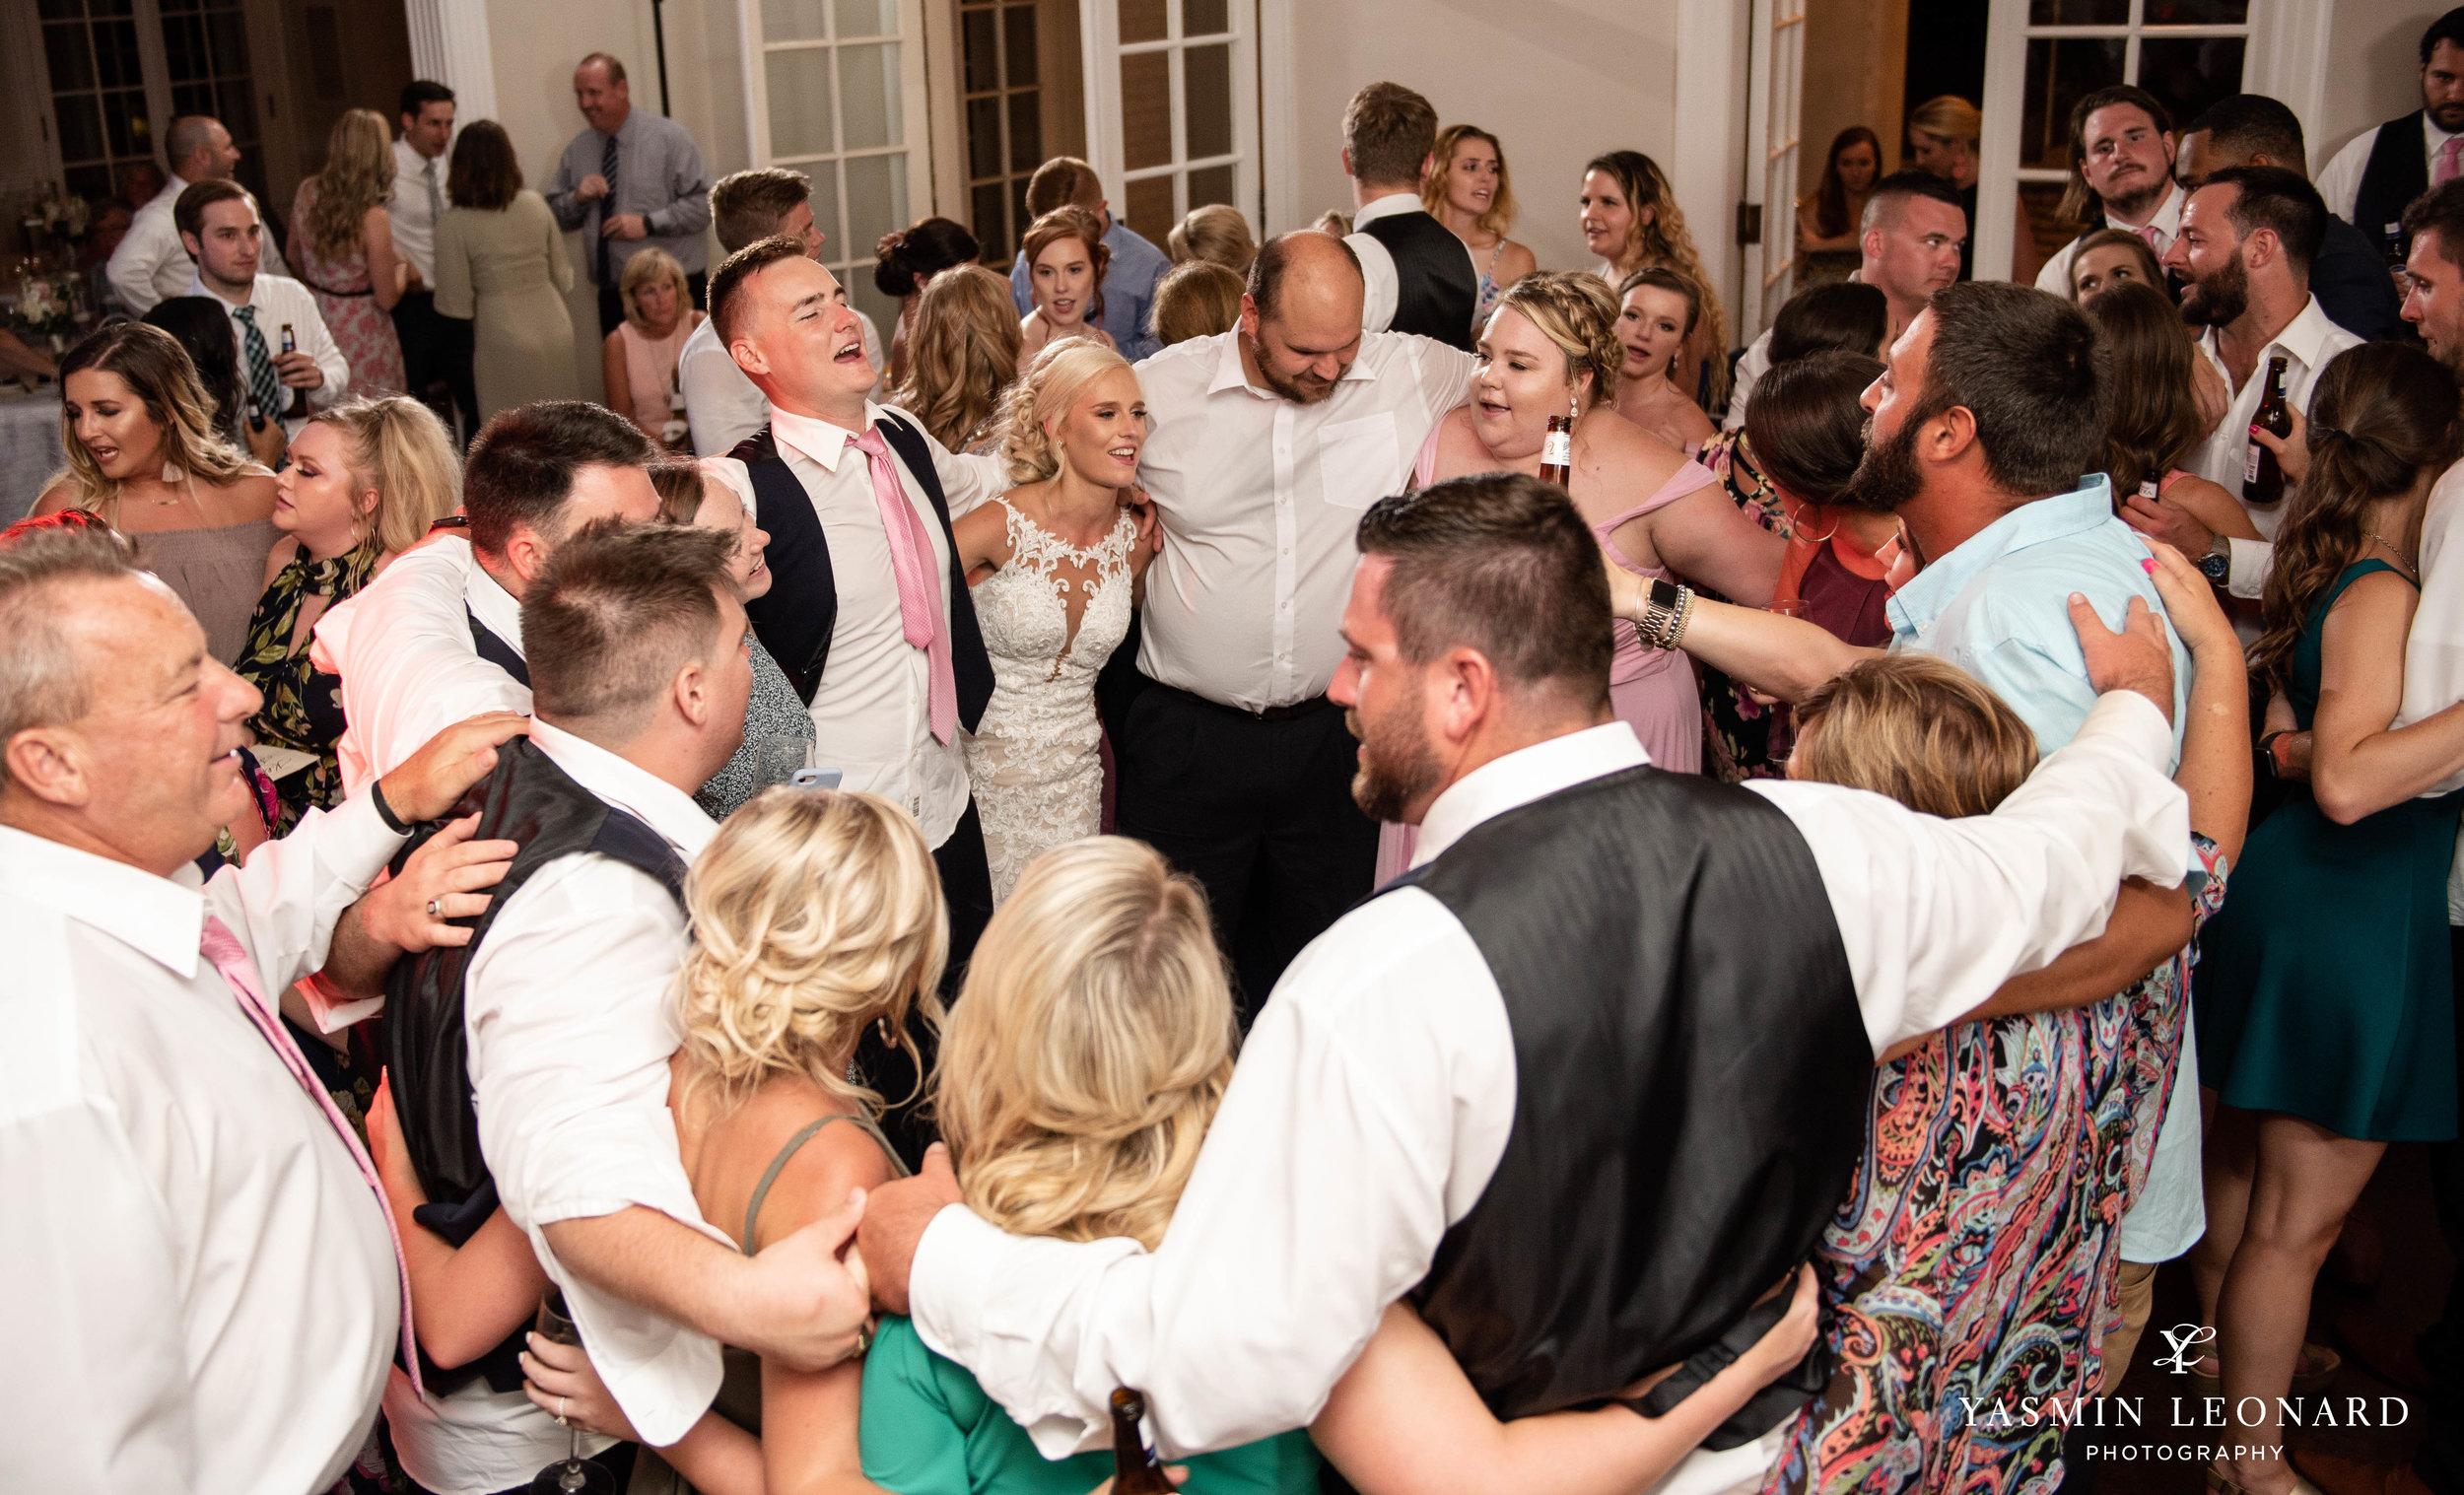 Separk Mansion - NC Weddings - Gastonia Wedding - NC Wedding Venues - Pink and Blue Wedding Ideas - Pink Bridesmaid Dresses - Yasmin Leonard Photography-71.jpg